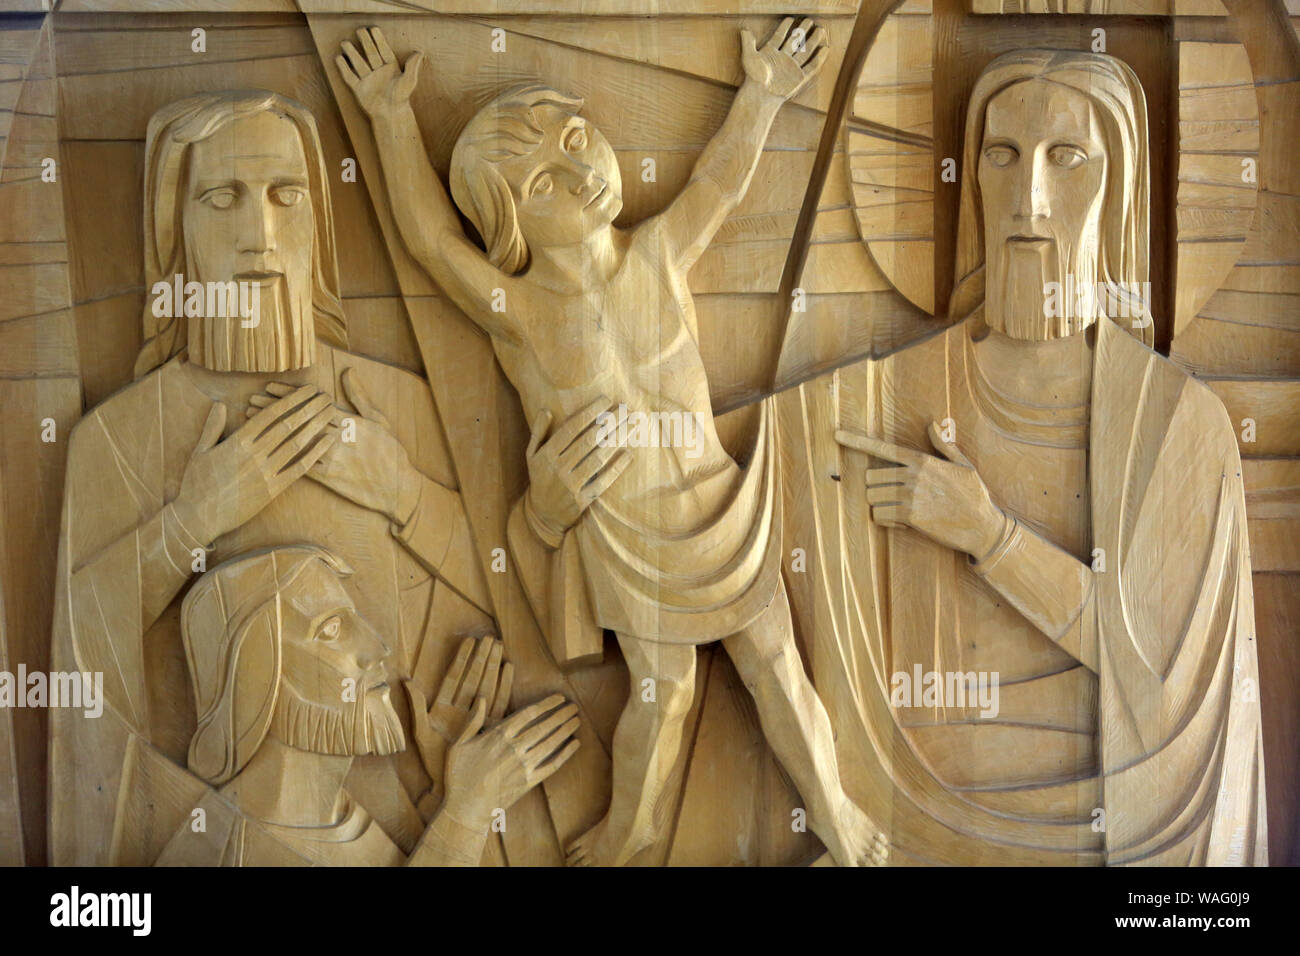 Jesus Christ. Saint Peter's Basilica in Capernaum. Isräel. Stock Photo